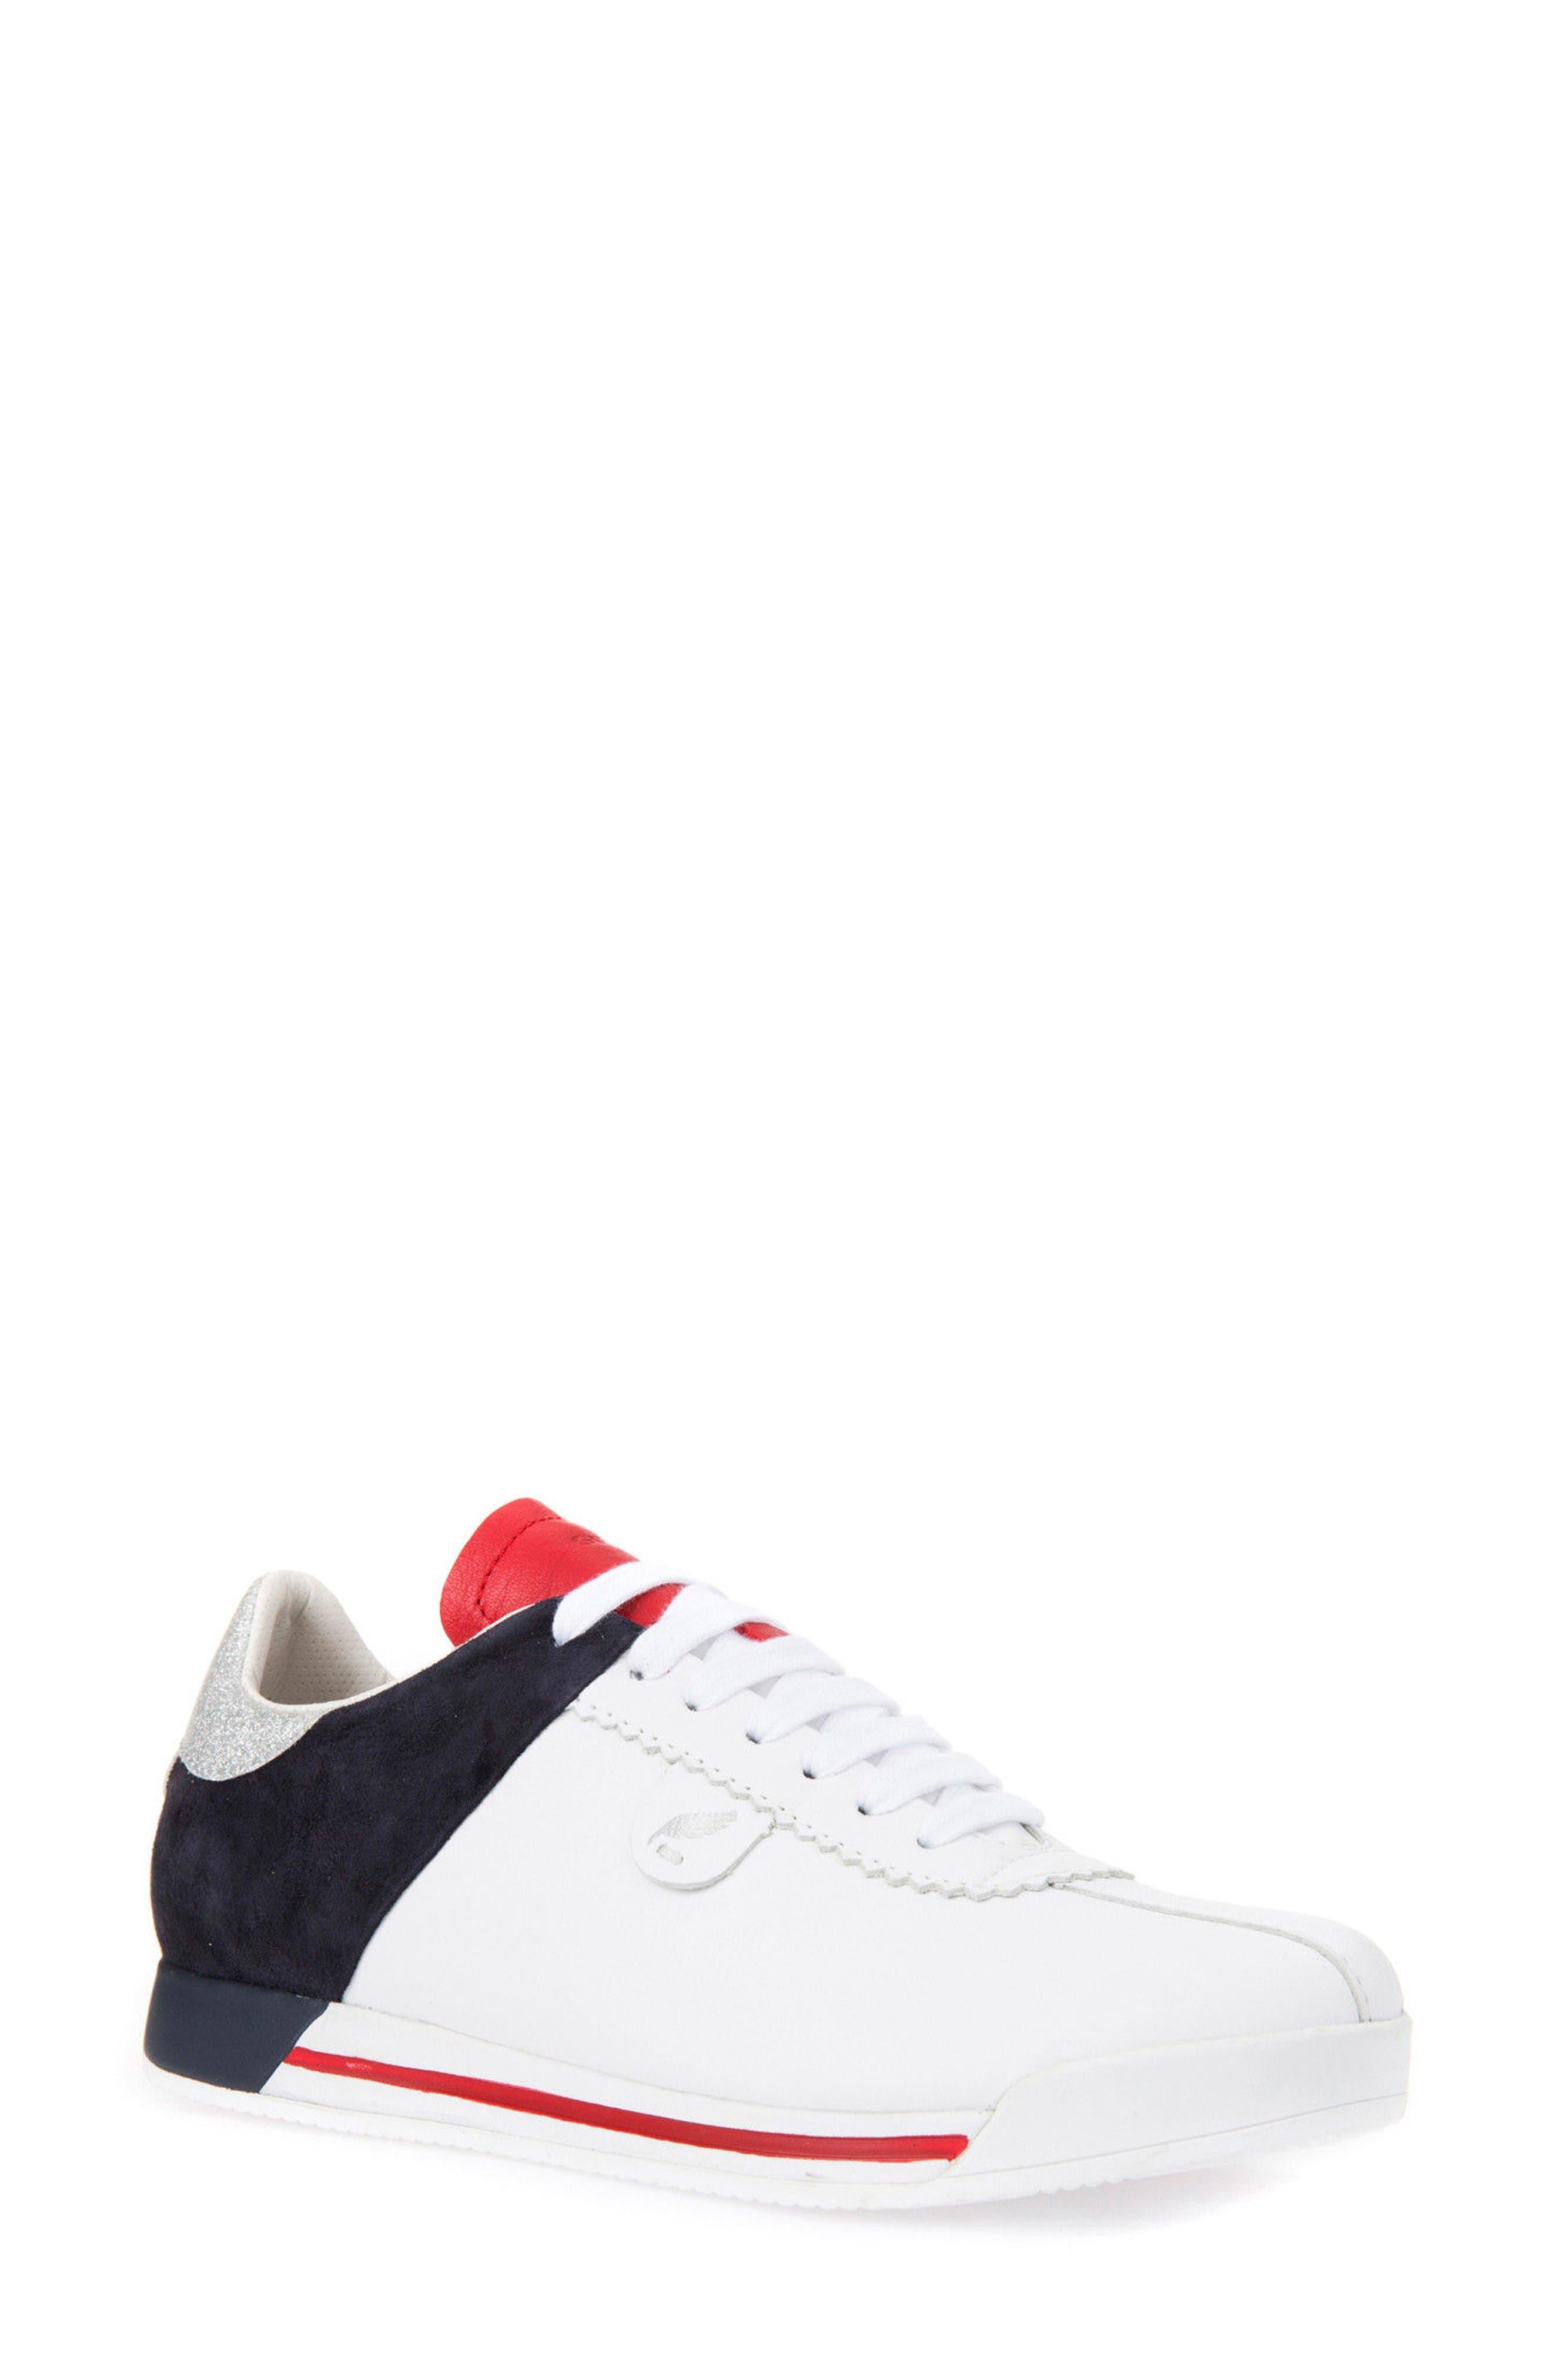 GEOX Chewa Sneaker